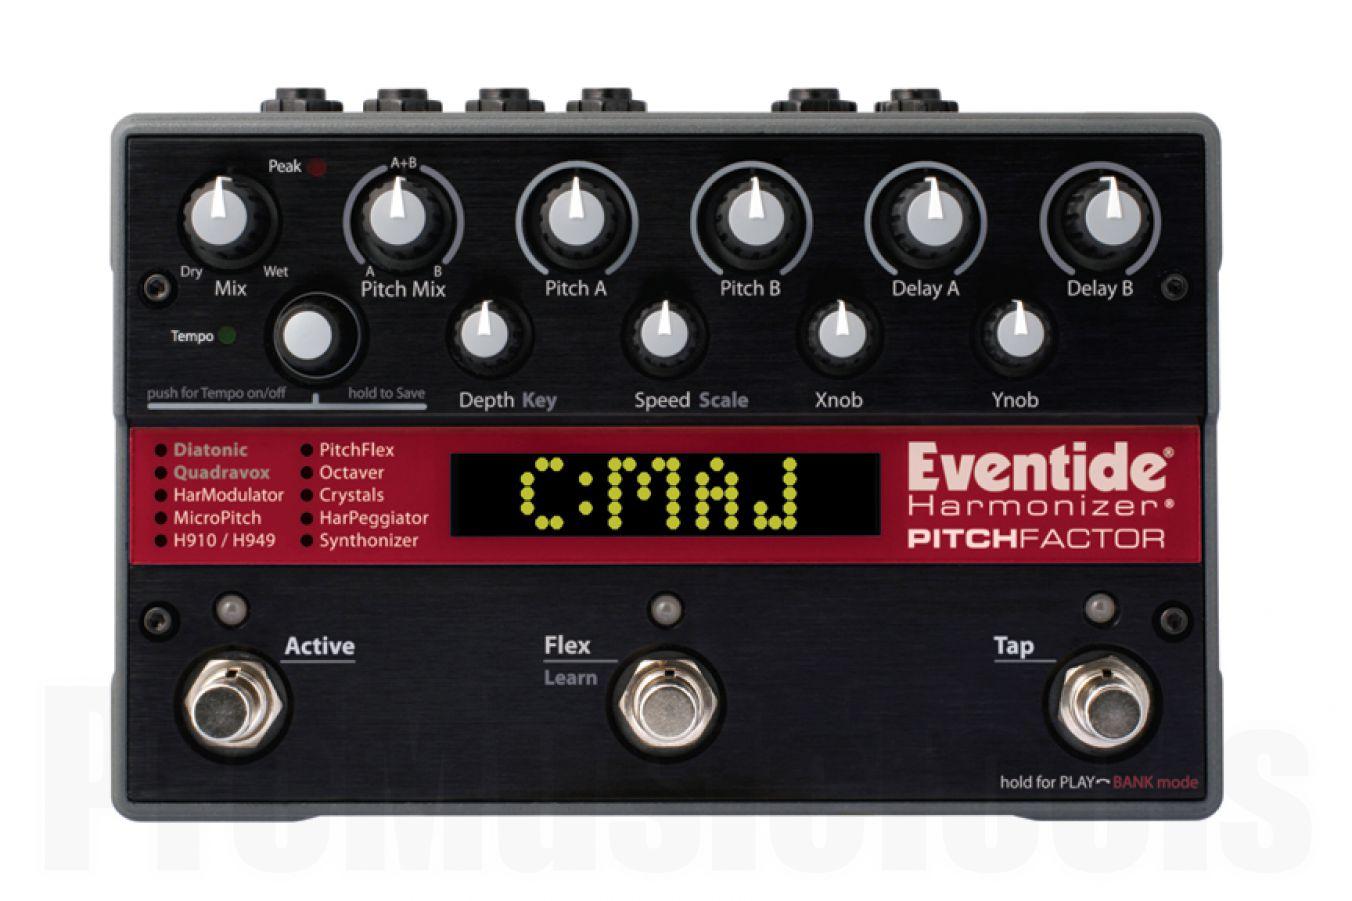 Eventide PitchFactor Harmonizer - demo